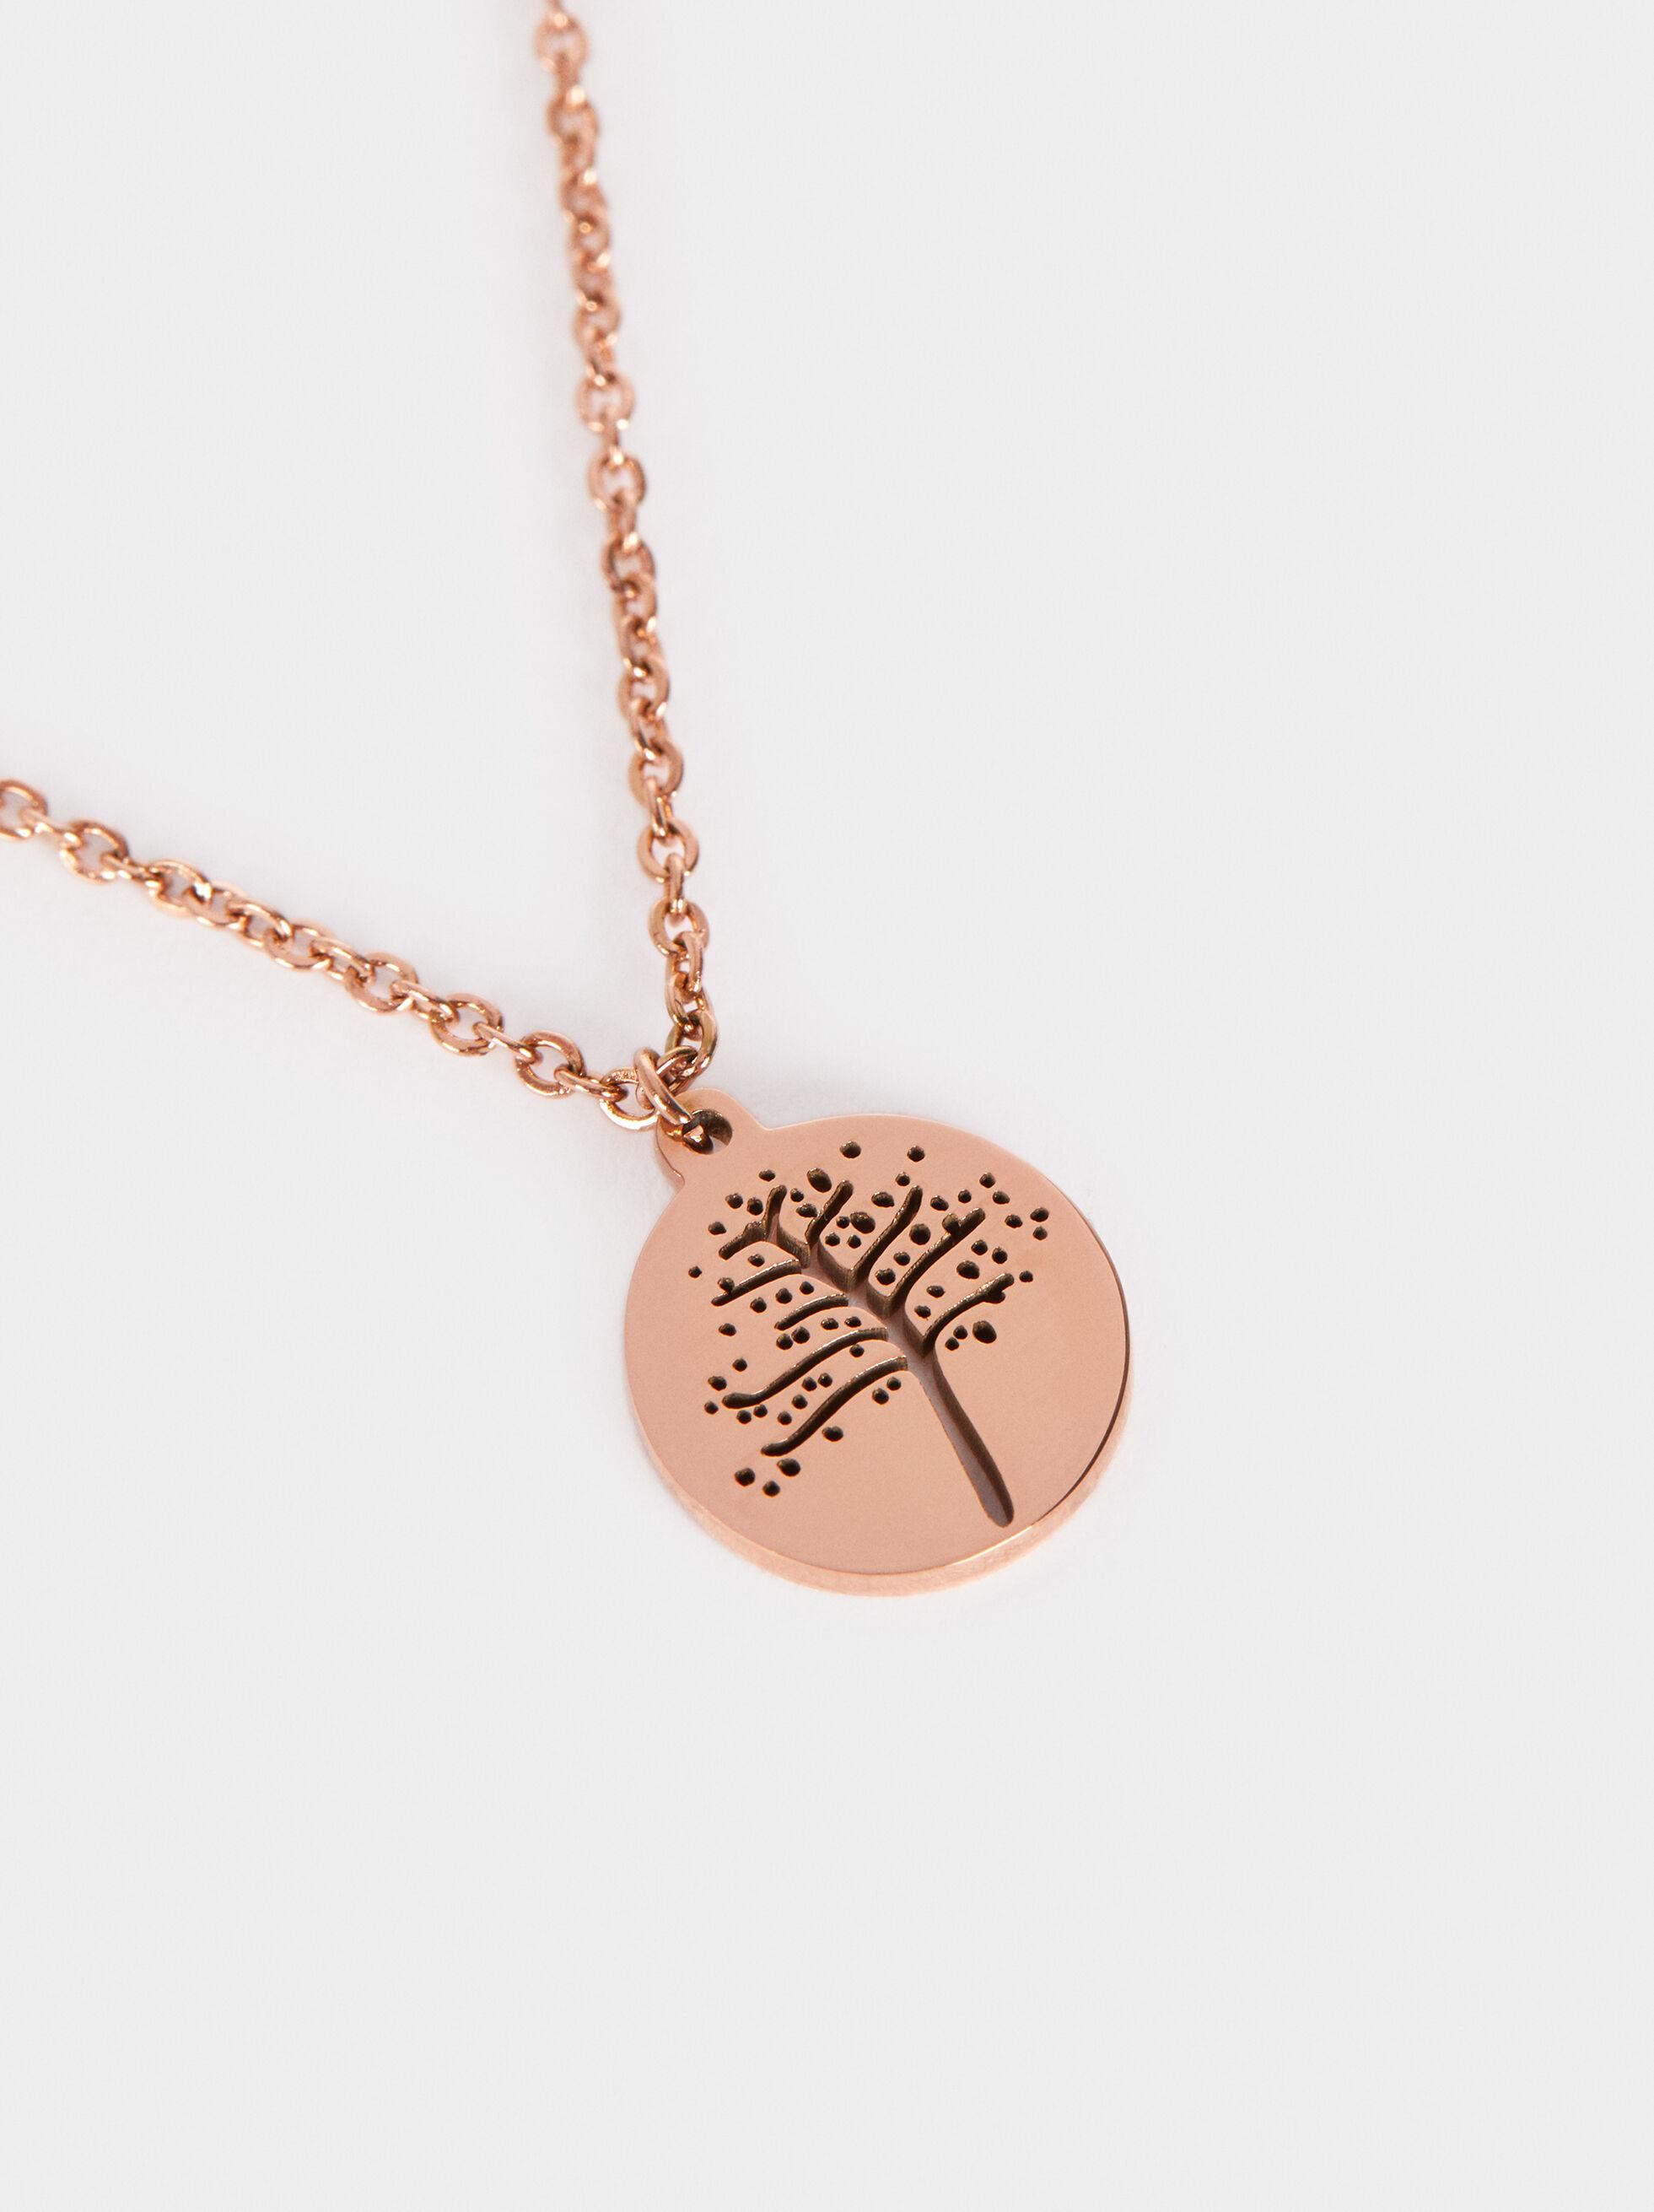 Short Steel Necklace With Tree Pendant, Orange, hi-res